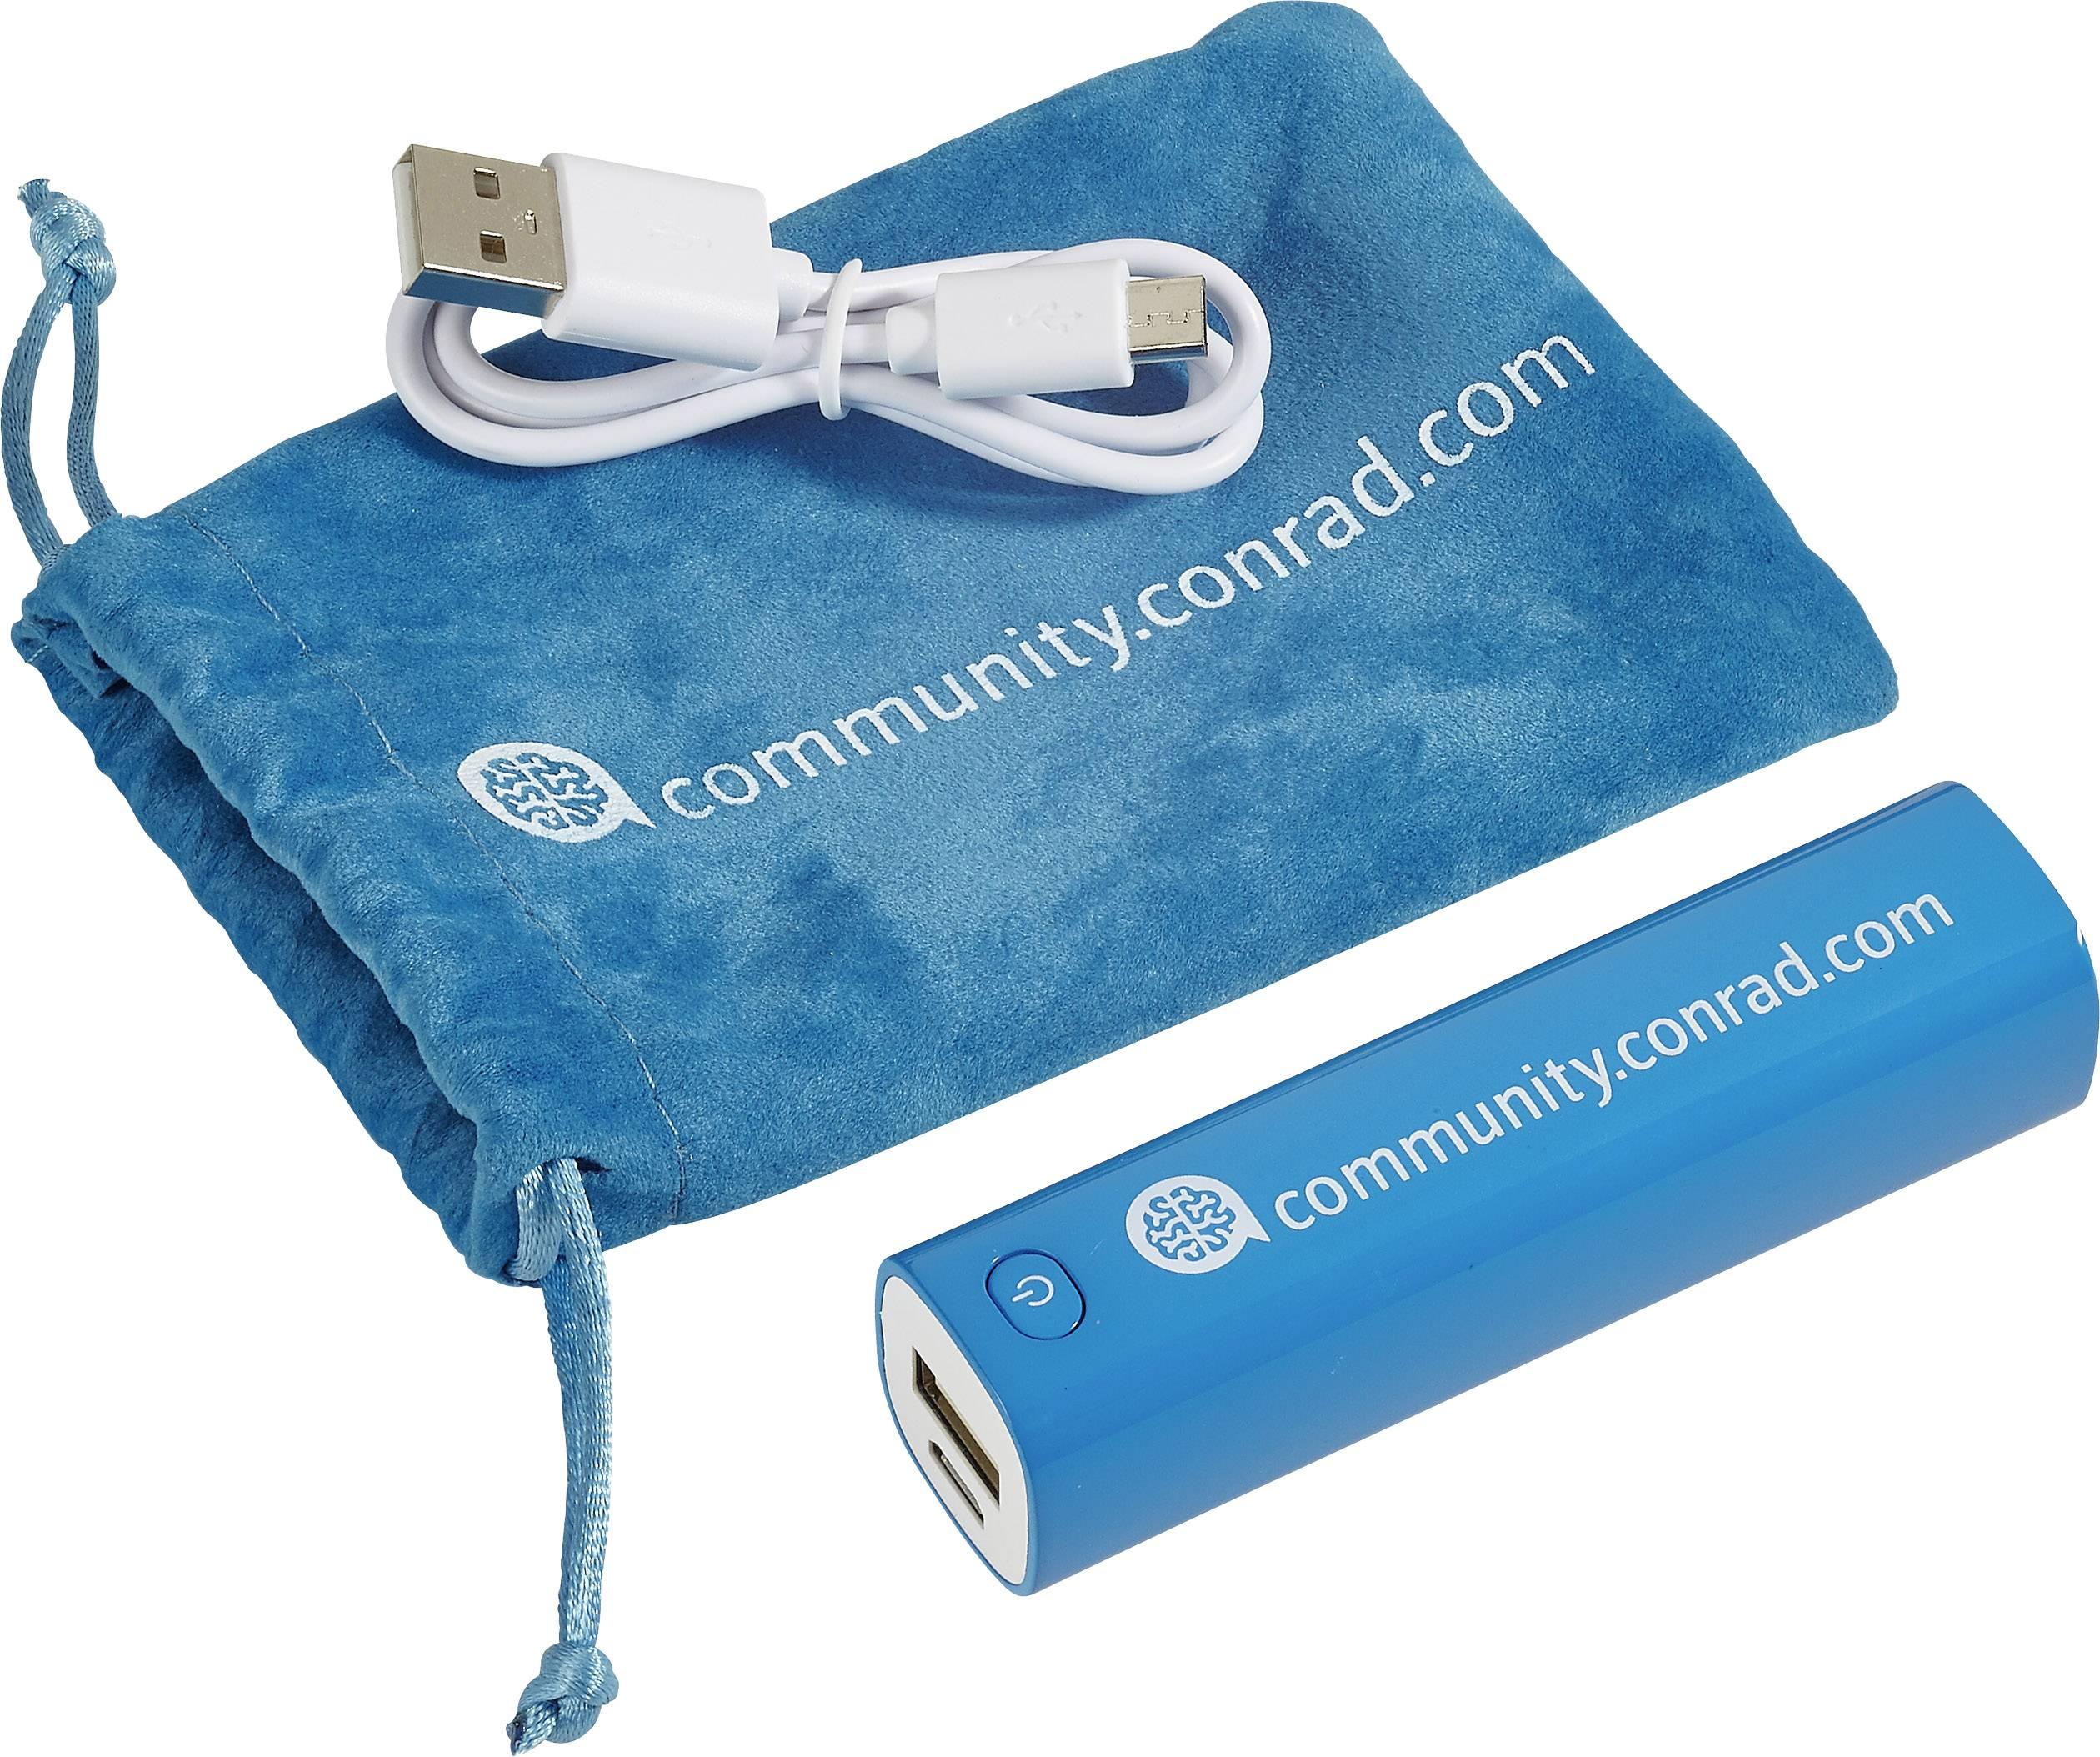 Powerbanka VOLTCRAFT Conrad community, Li-Ion akumulátor 2600 mAh, azúrová